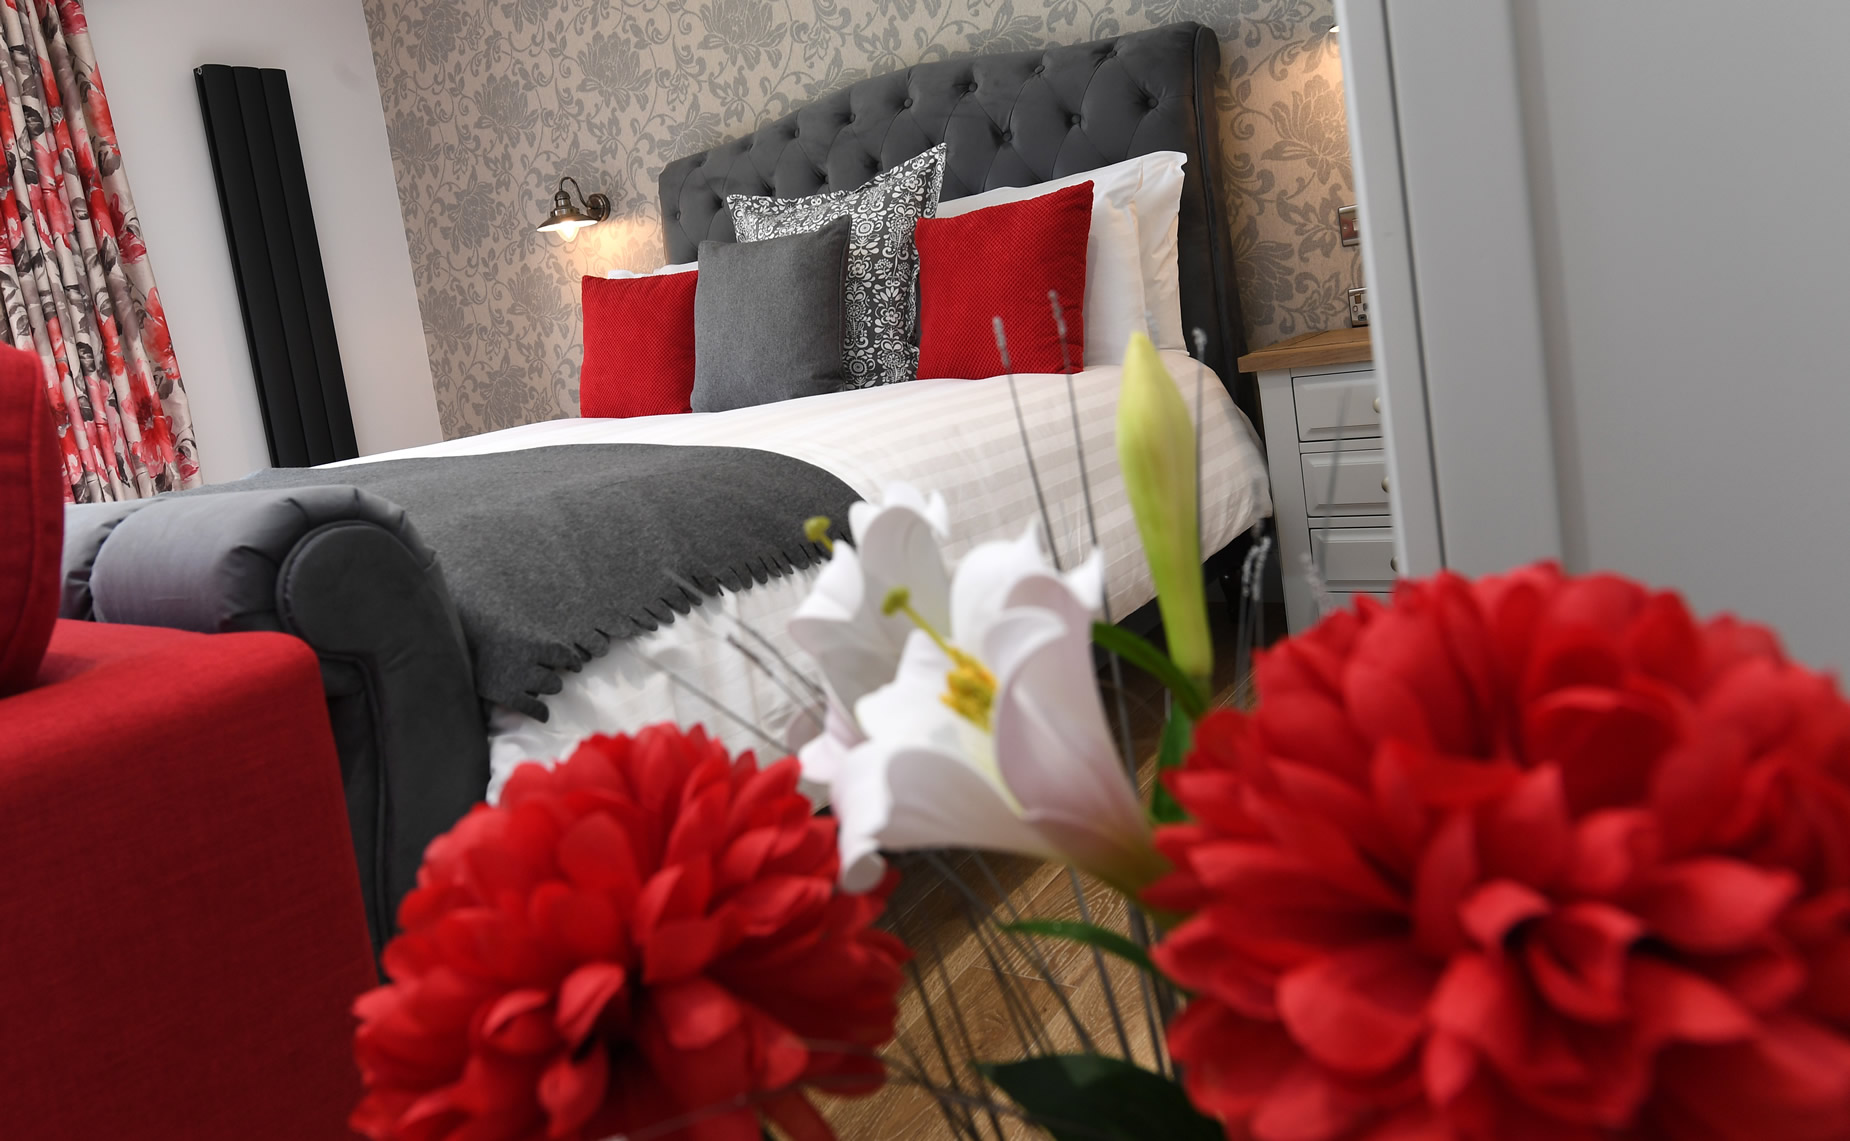 Luxury Lodges Oxfordshire Panshill Accommodation